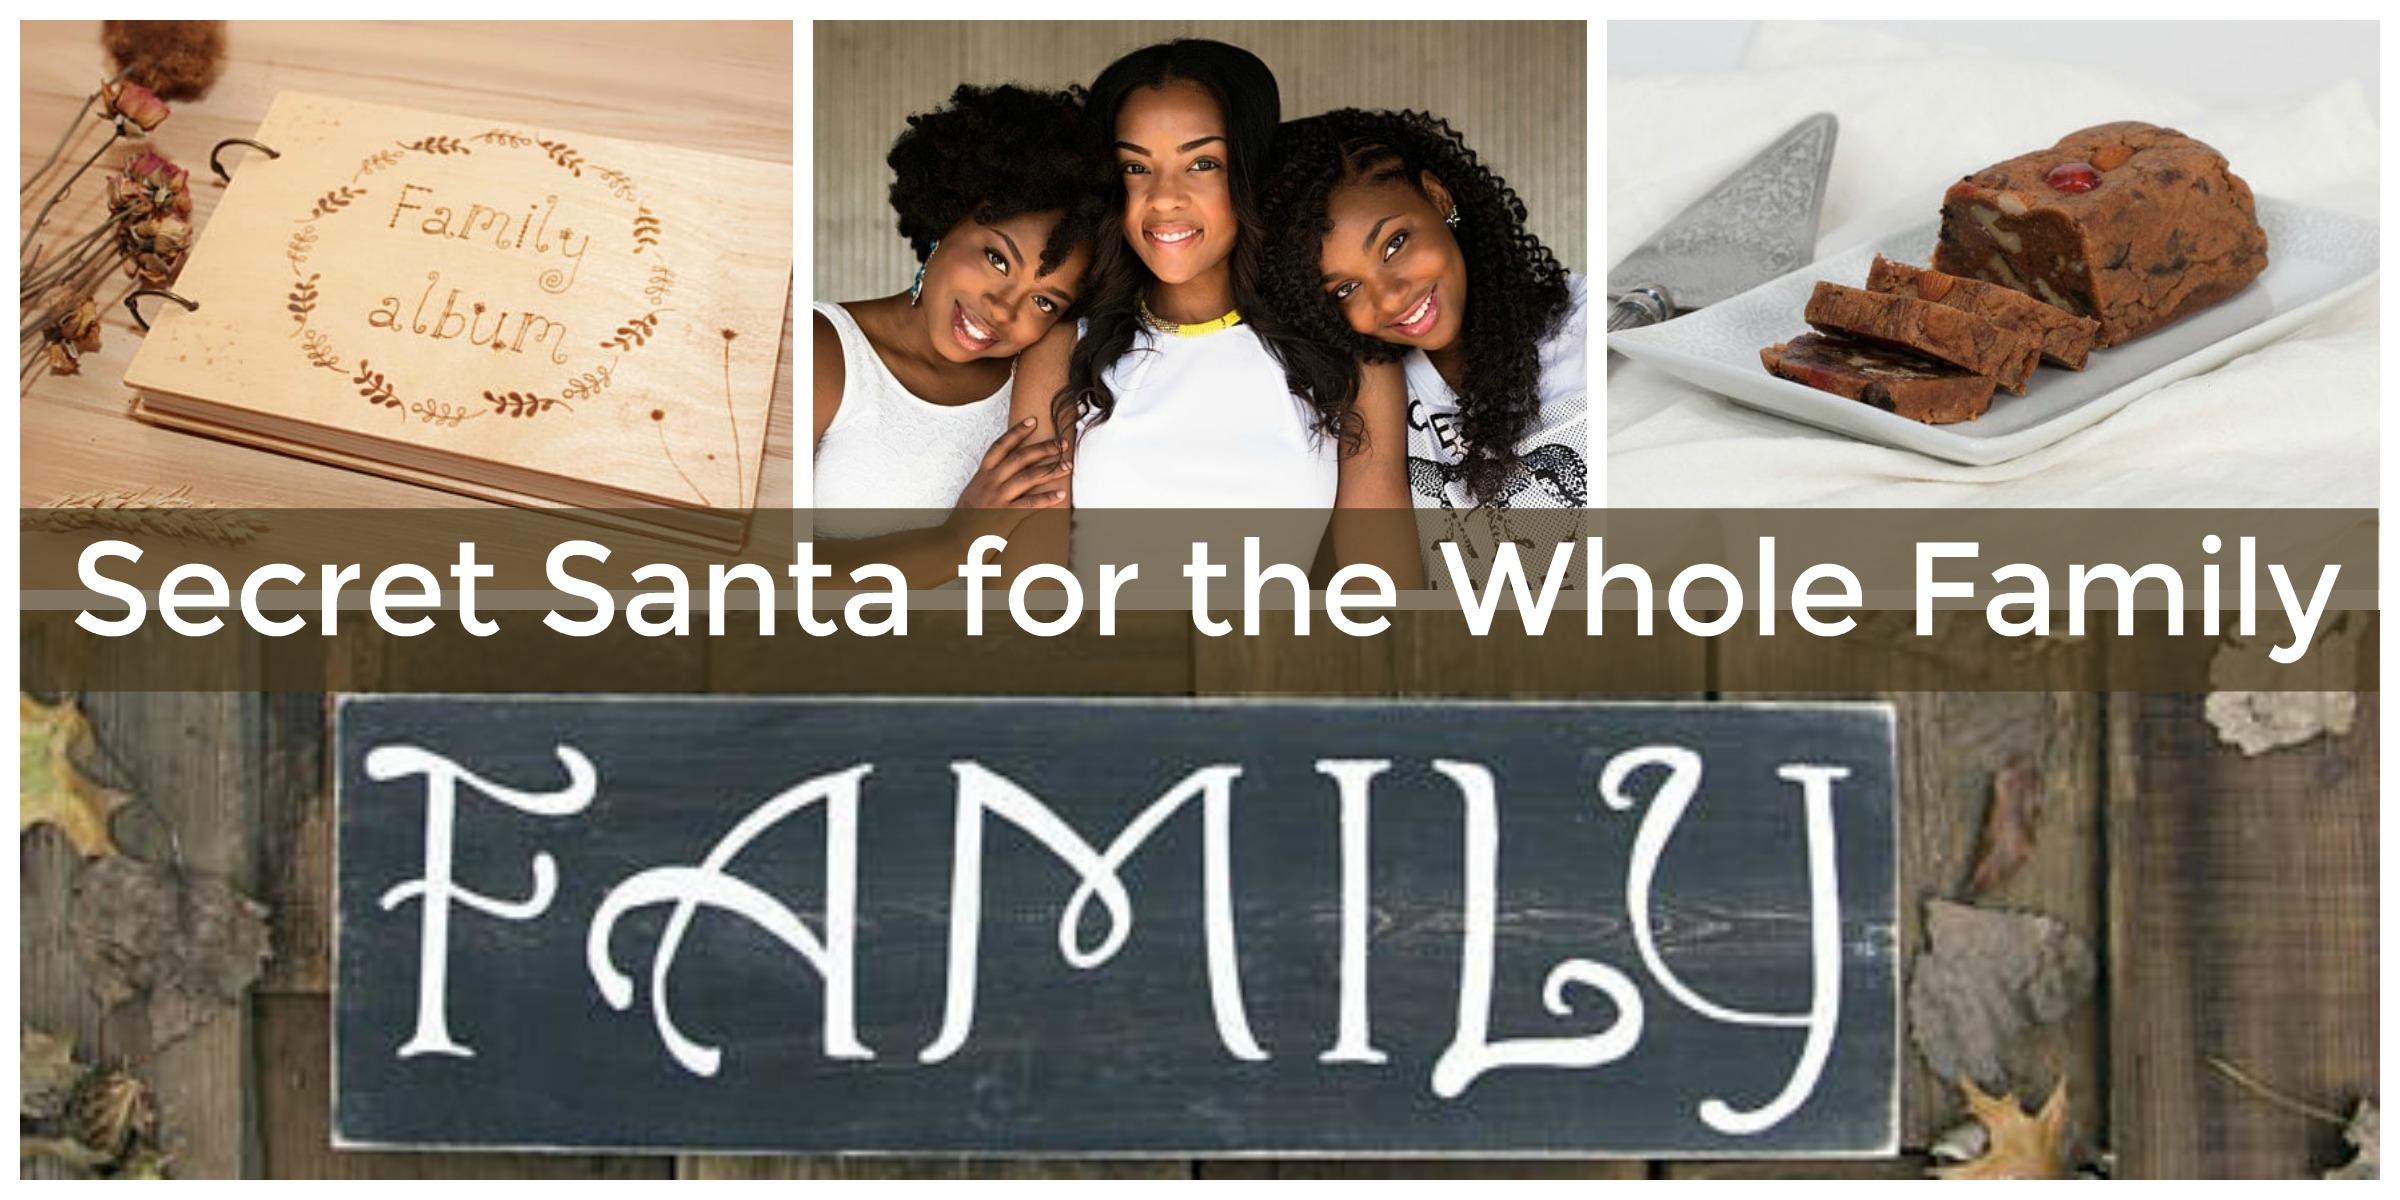 Cousin christmas gift exchange ideas themes